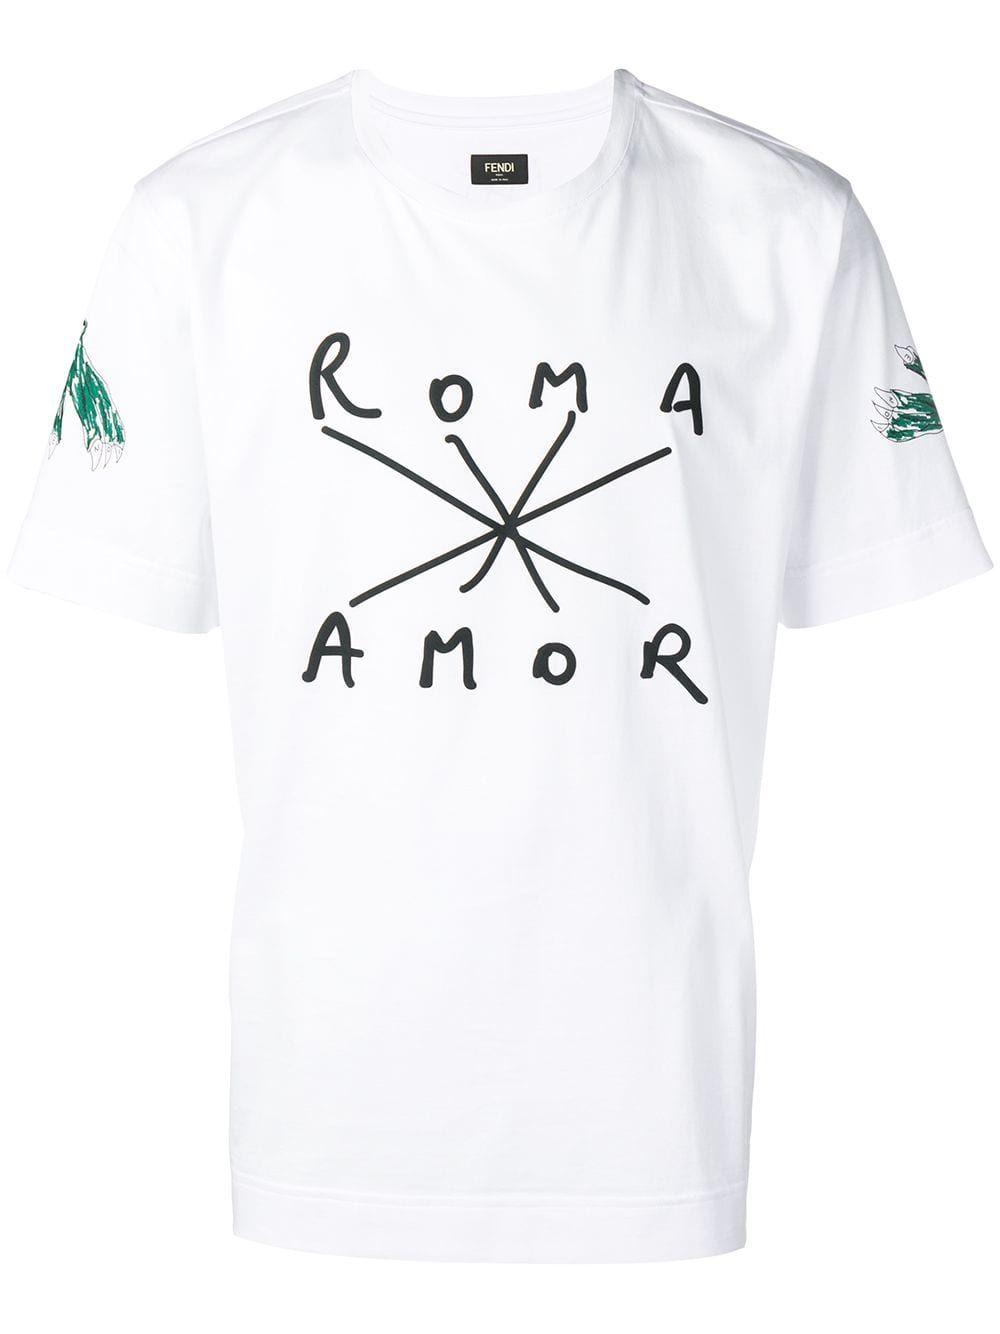 fd50ca91 FENDI FENDI ROMA AMOR T-SHIRT - WHITE. #fendi #cloth | Fendi in 2019 ...